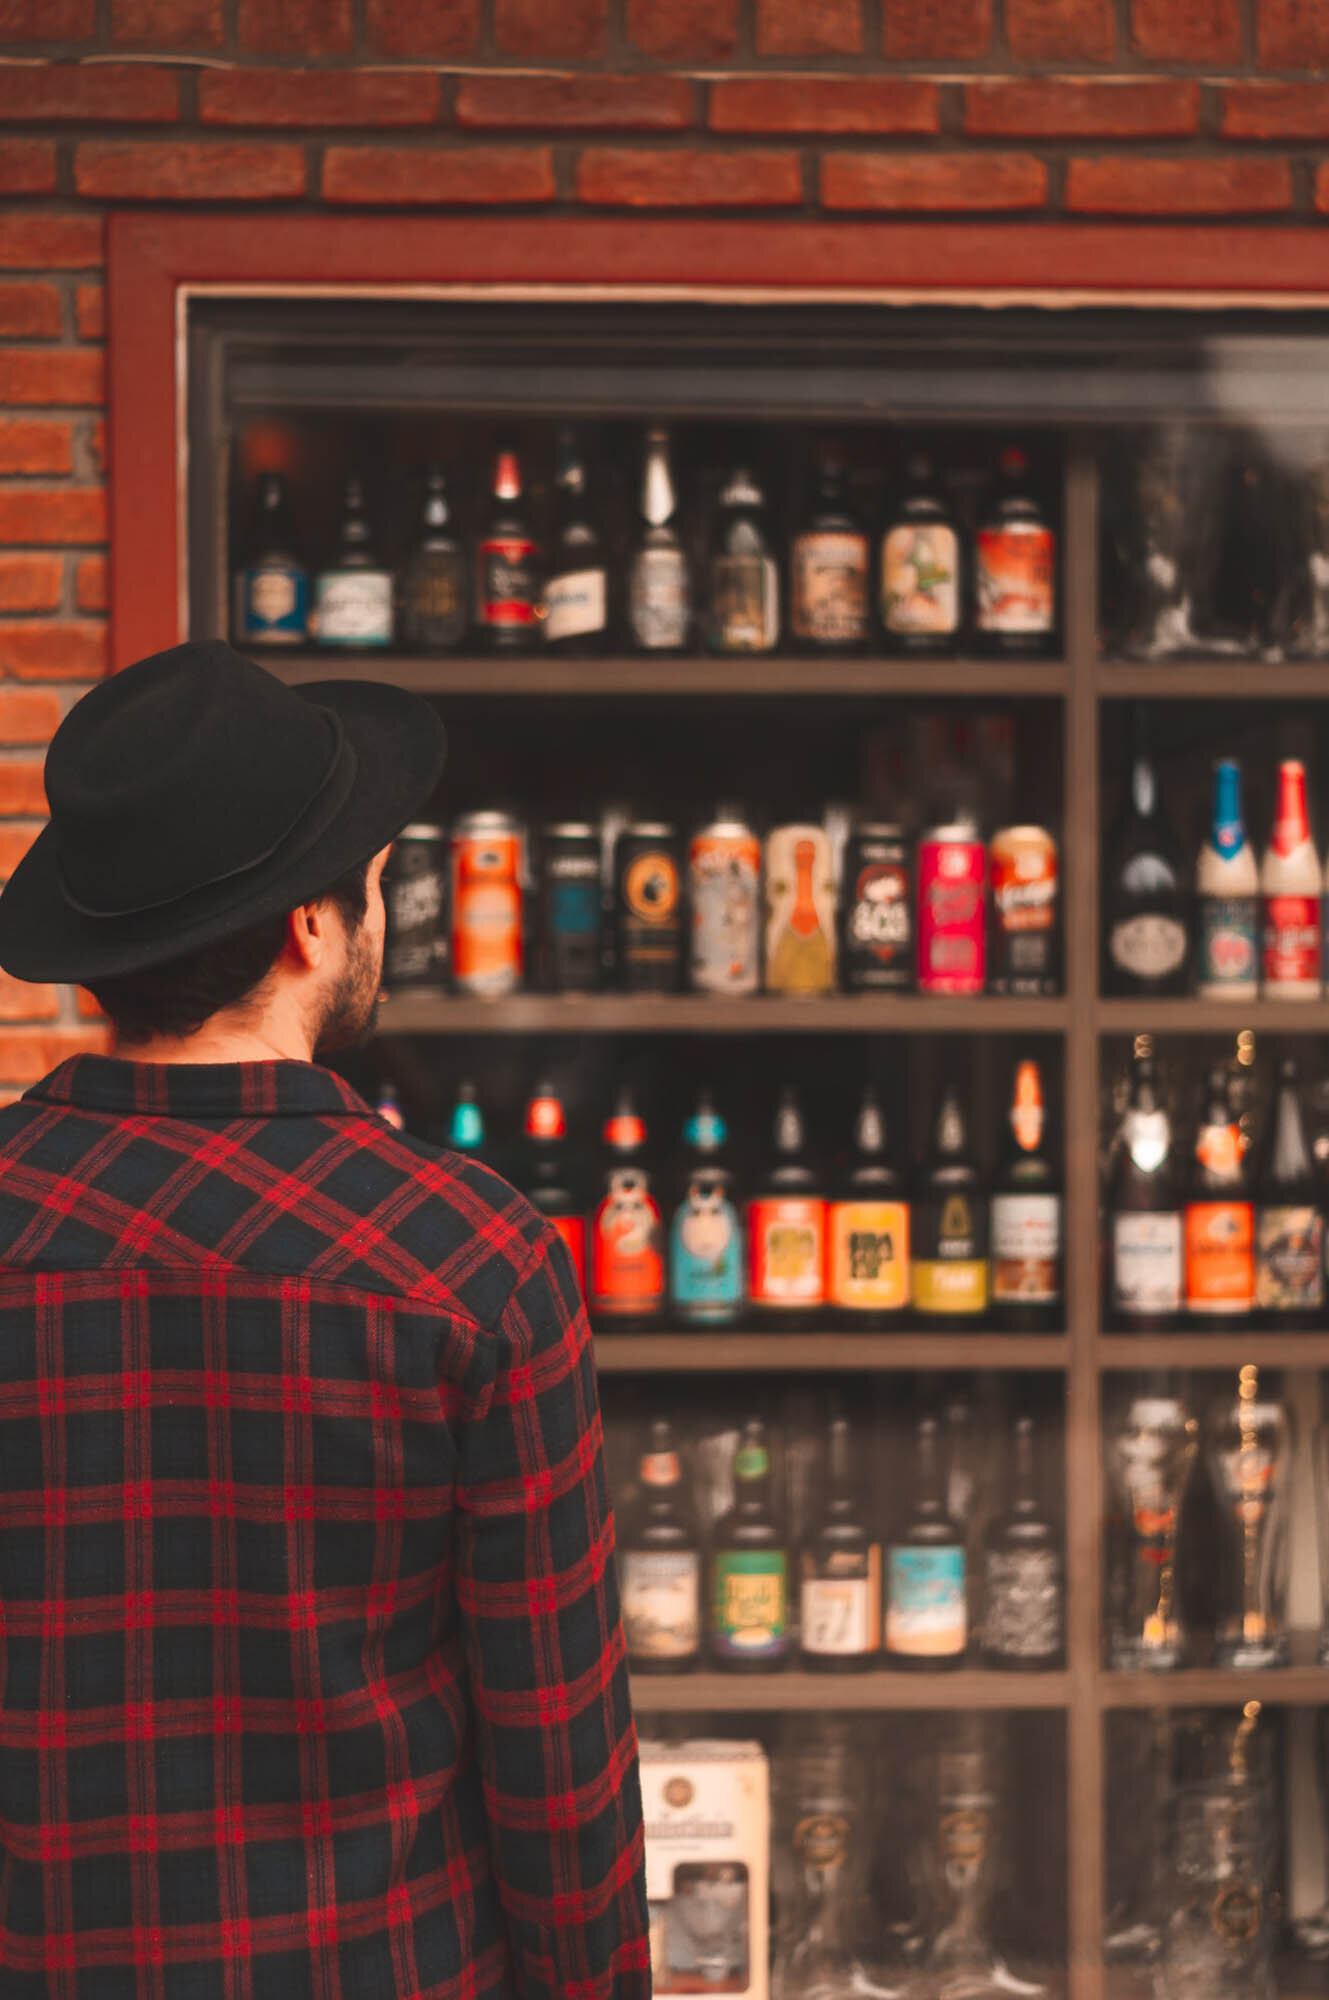 alcoholic-beverages-back-view-beer-2076748.jpg